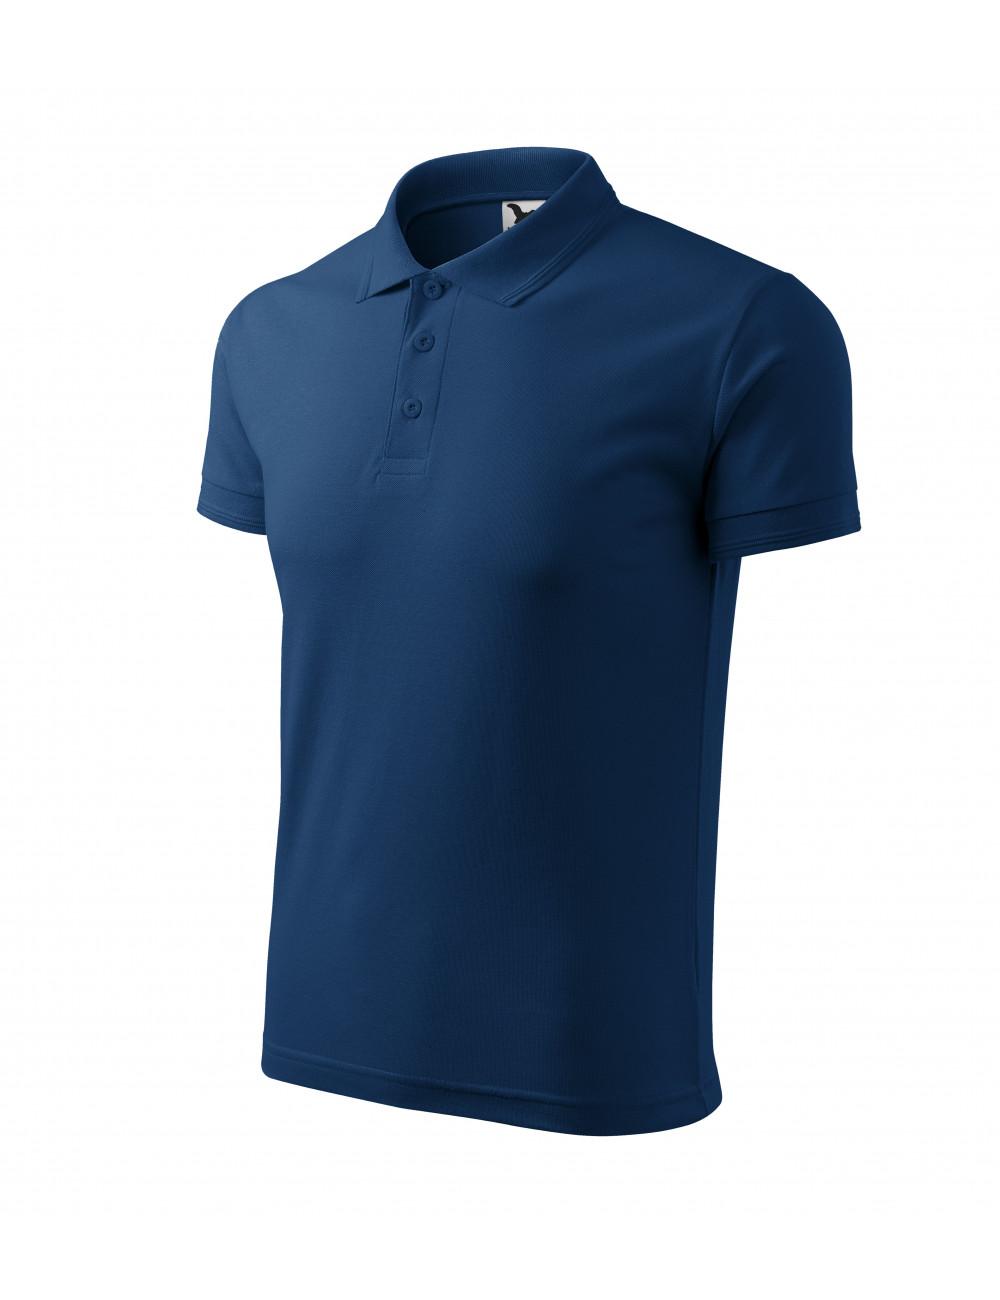 Adler MALFINI Koszulka polo męska Pique Polo 203 ciemnoniebieski